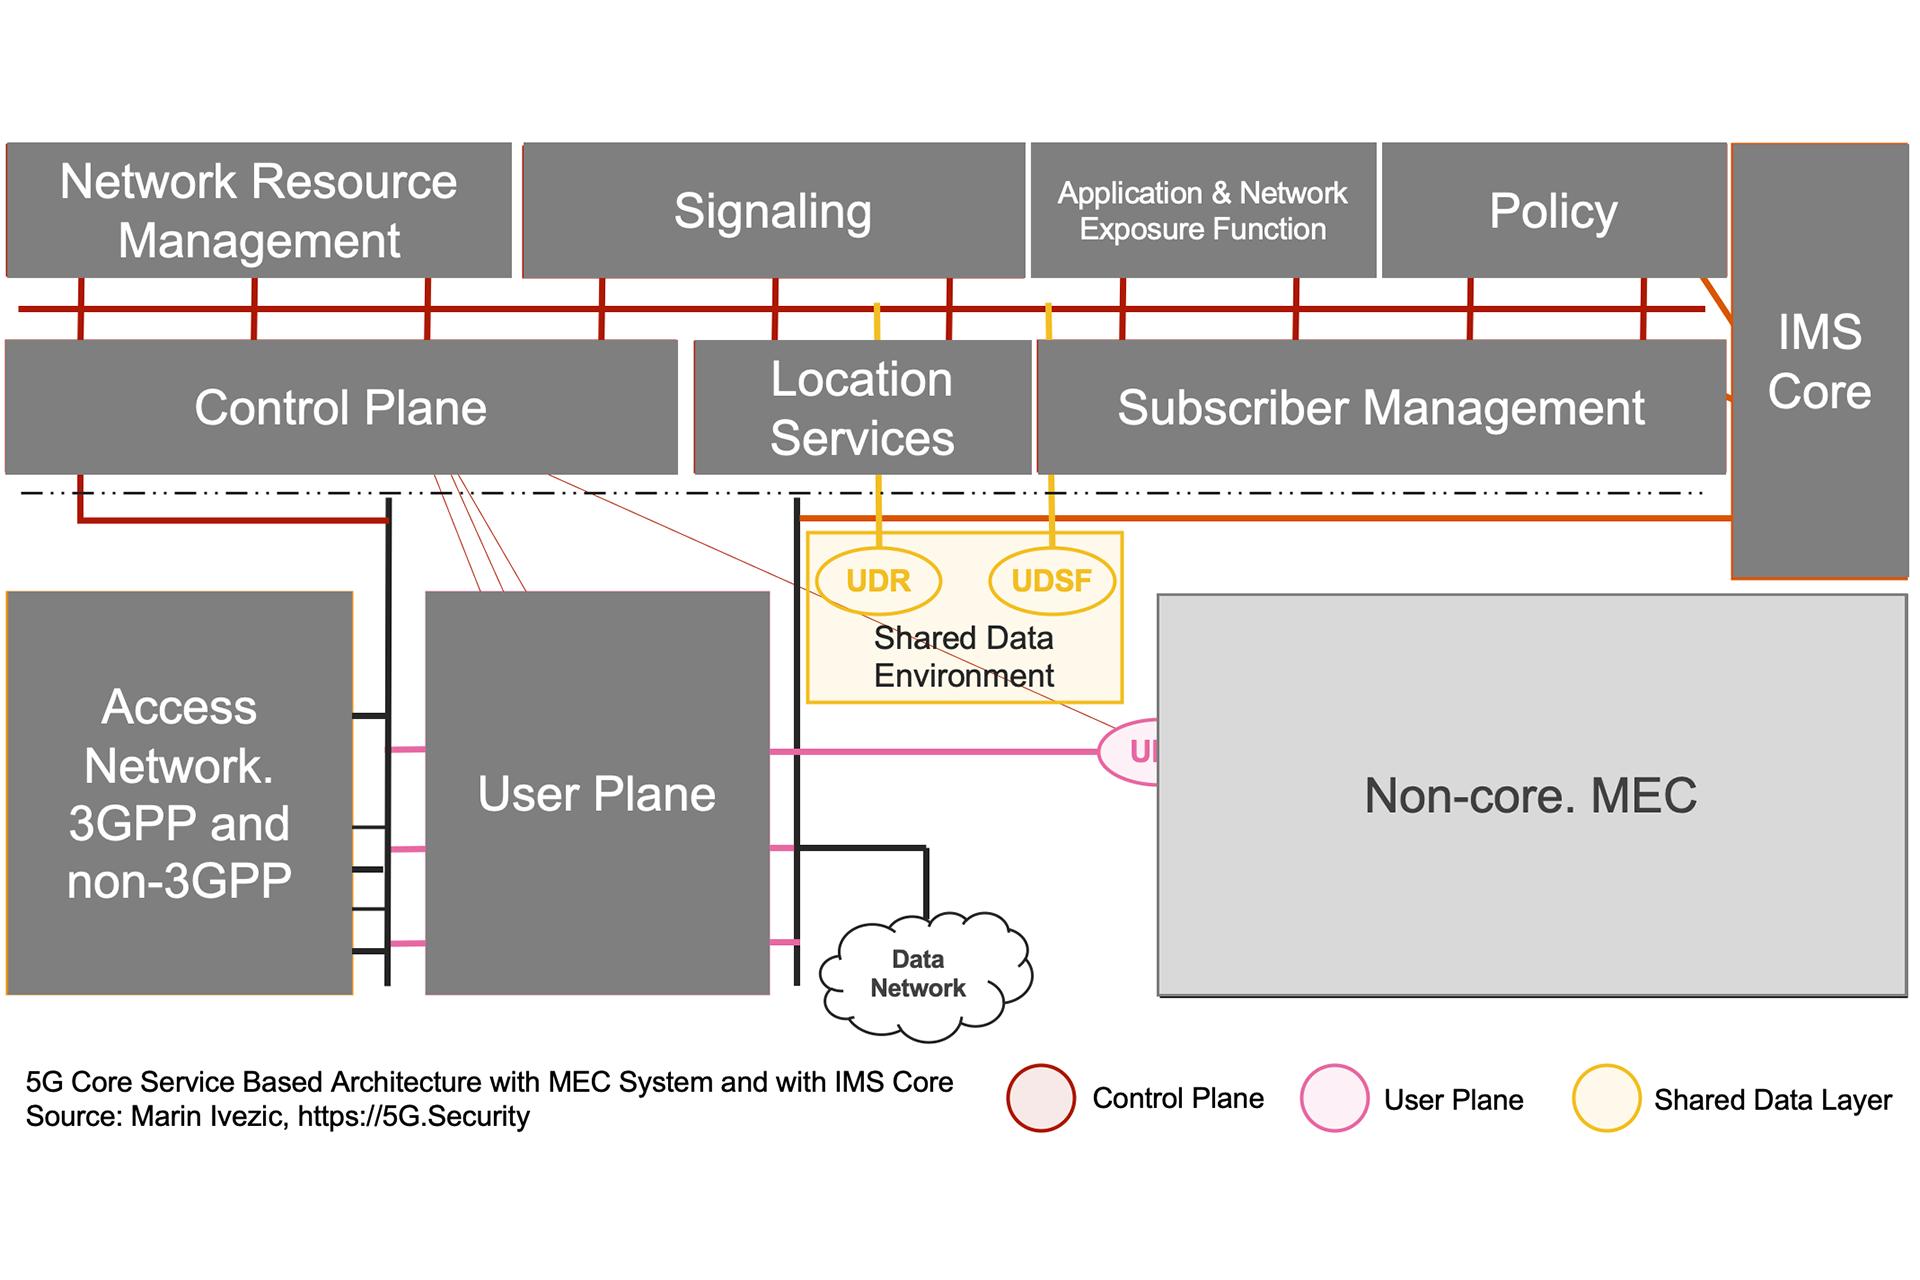 5G SBA IMS MEC Architecture - Subscriber Data